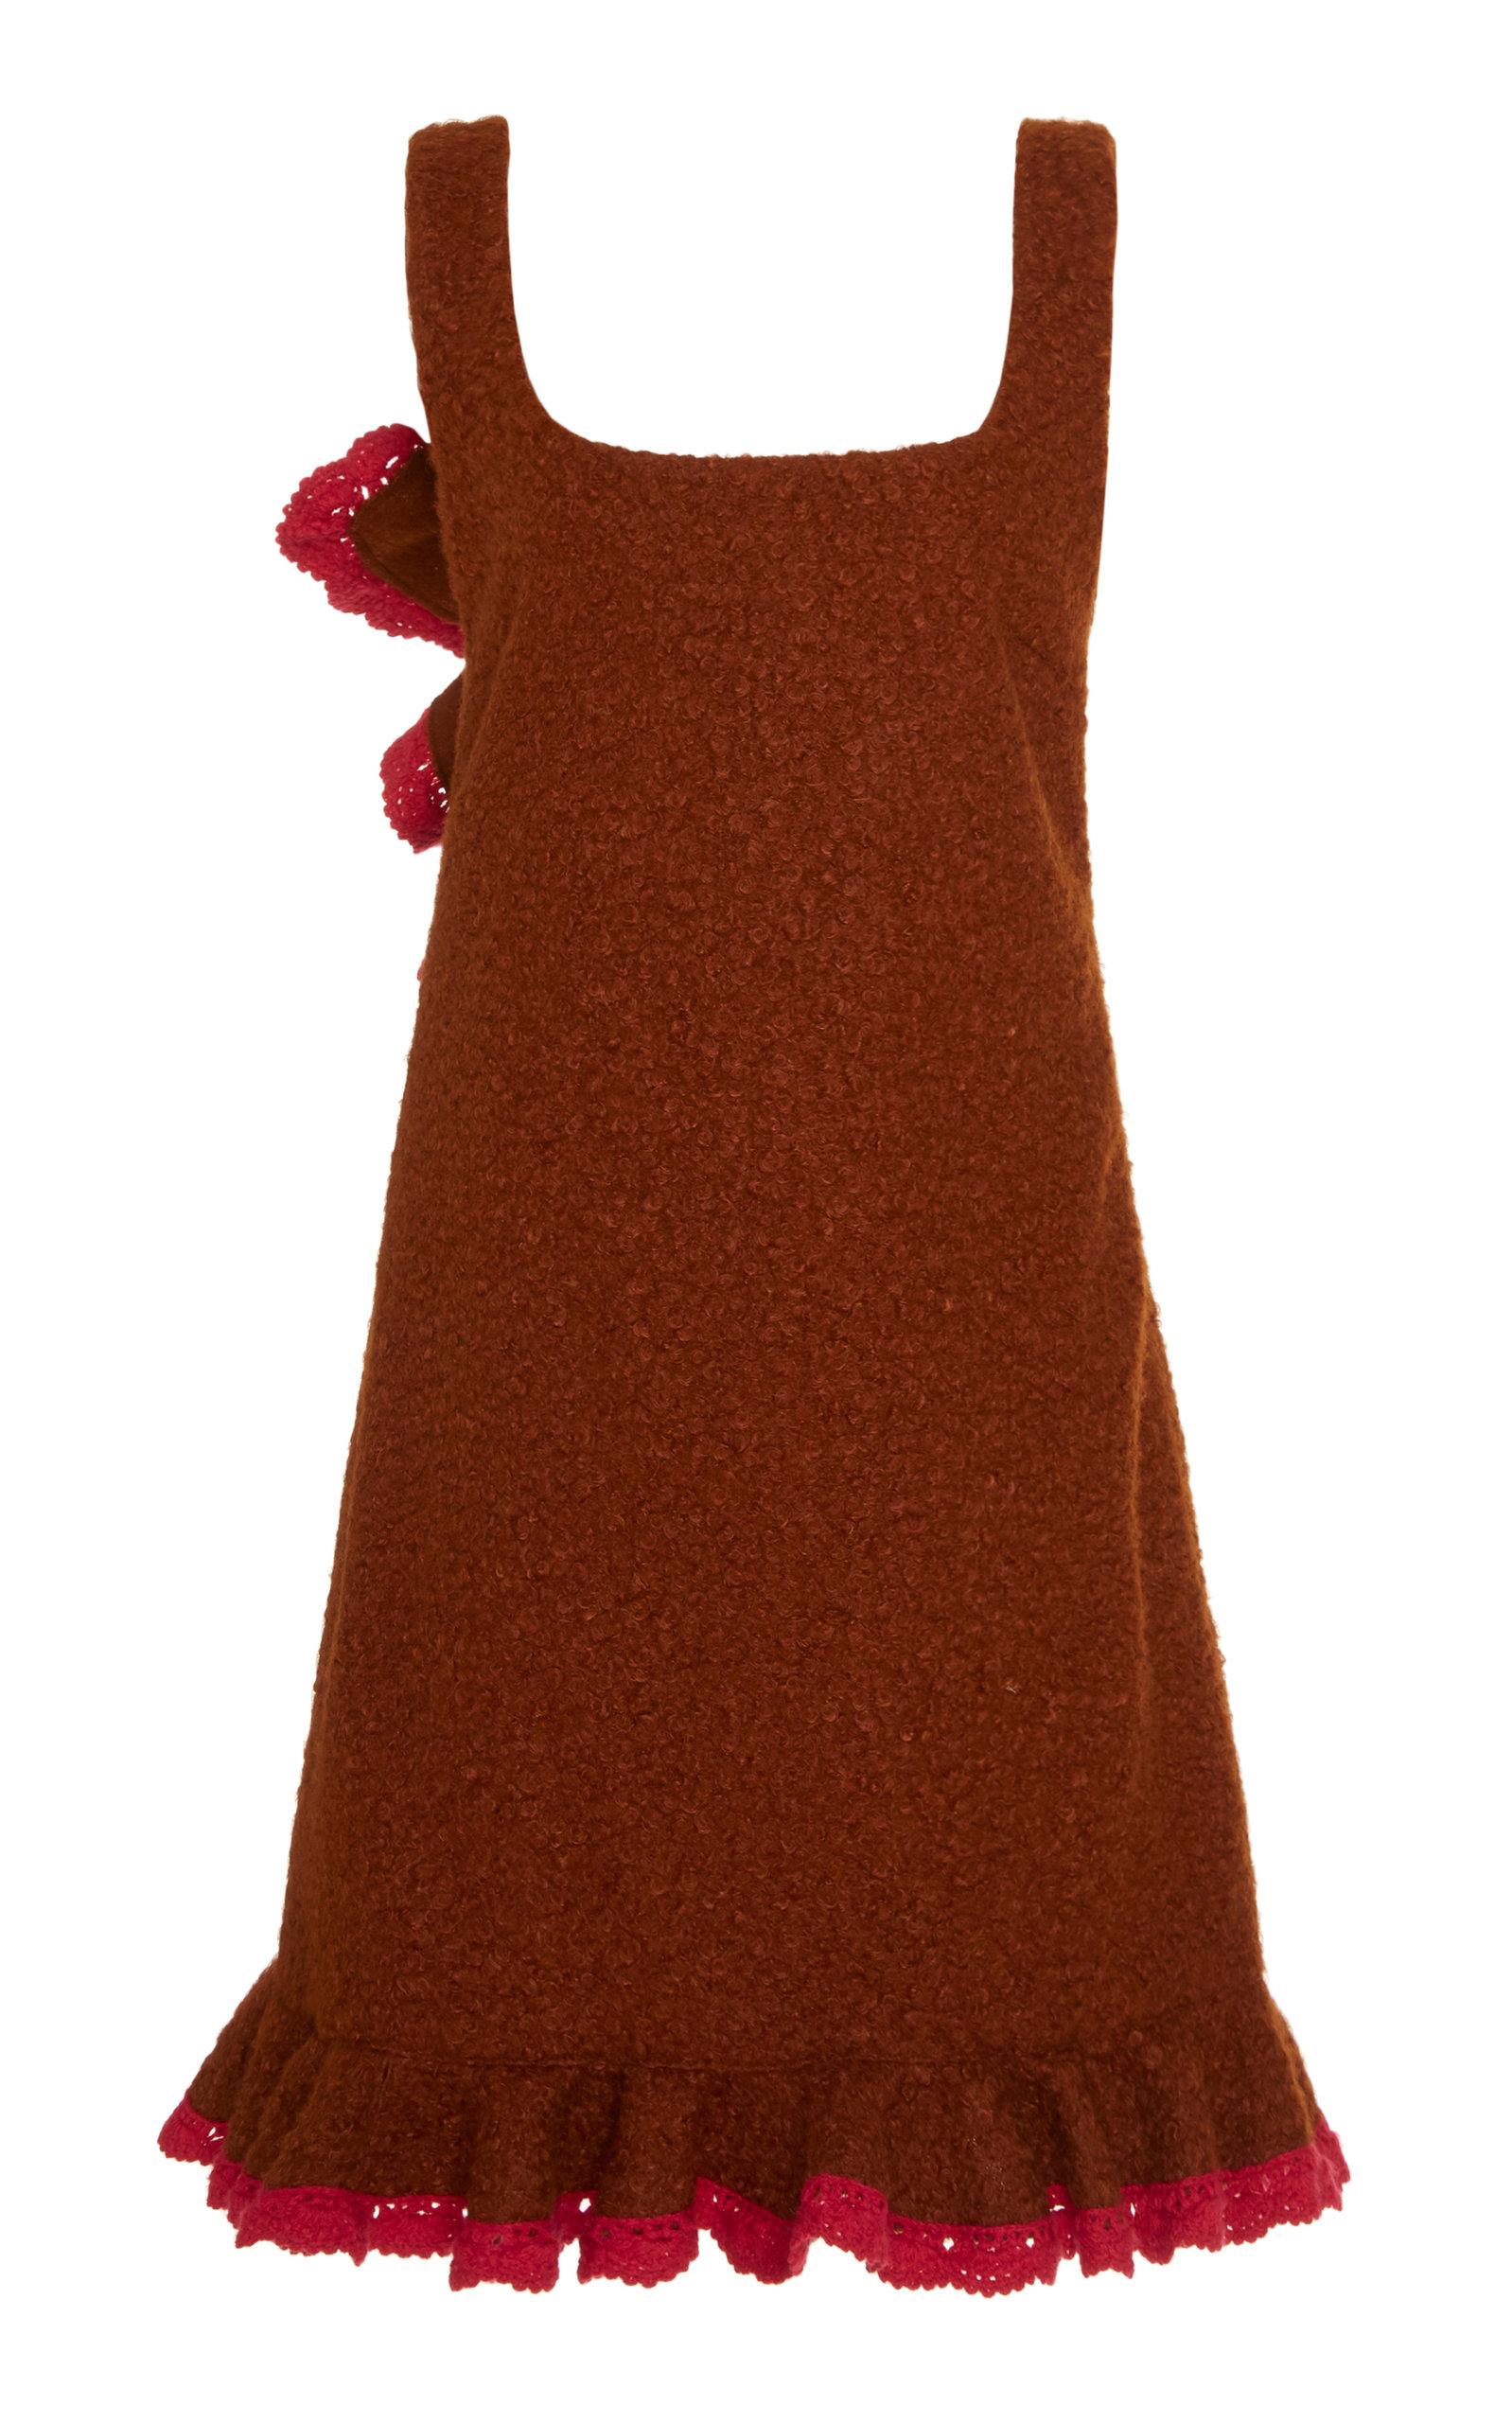 025aad1acb Bouclé Ruffled-Hem Jumper Dress by Anna Sui | Moda Operandi